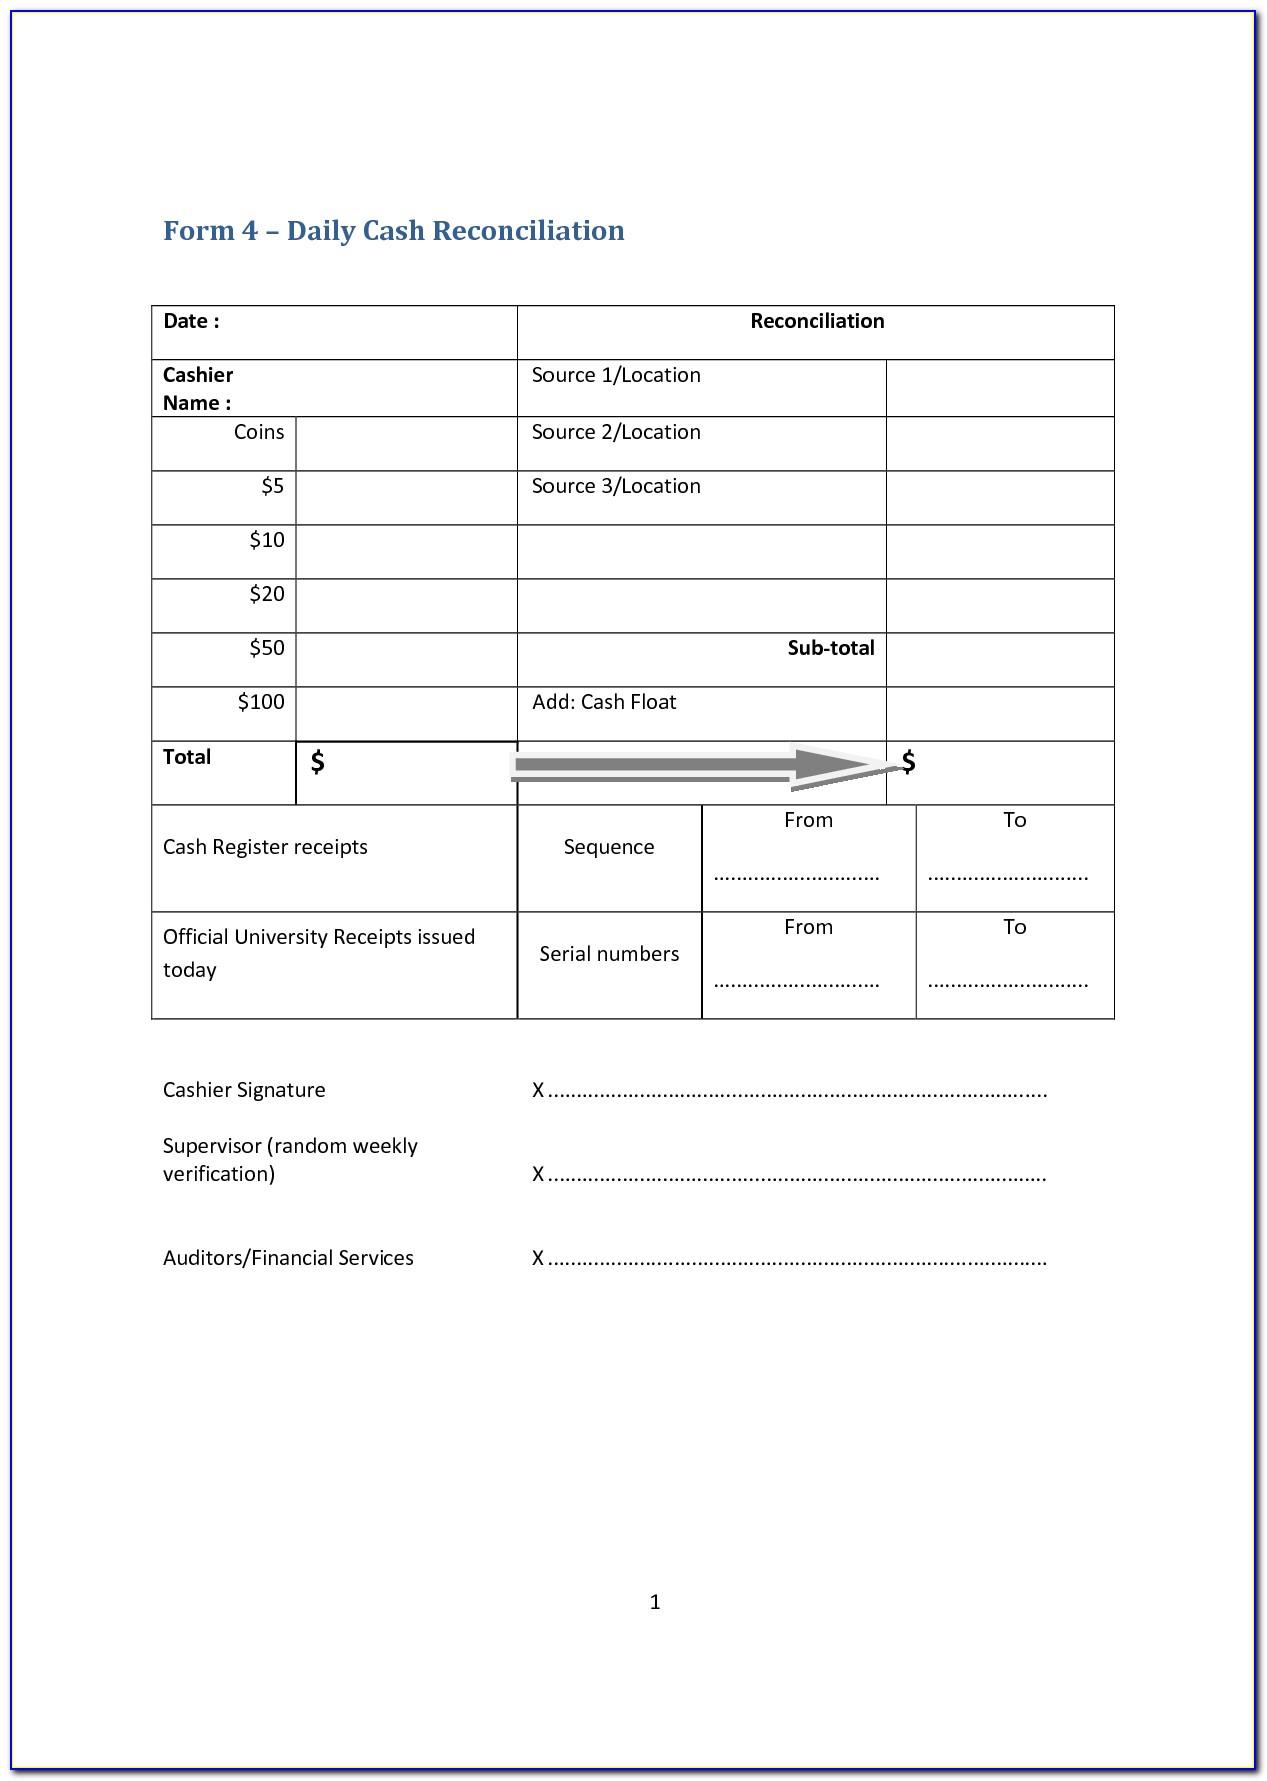 Cash Register Reconciliation Form Excel